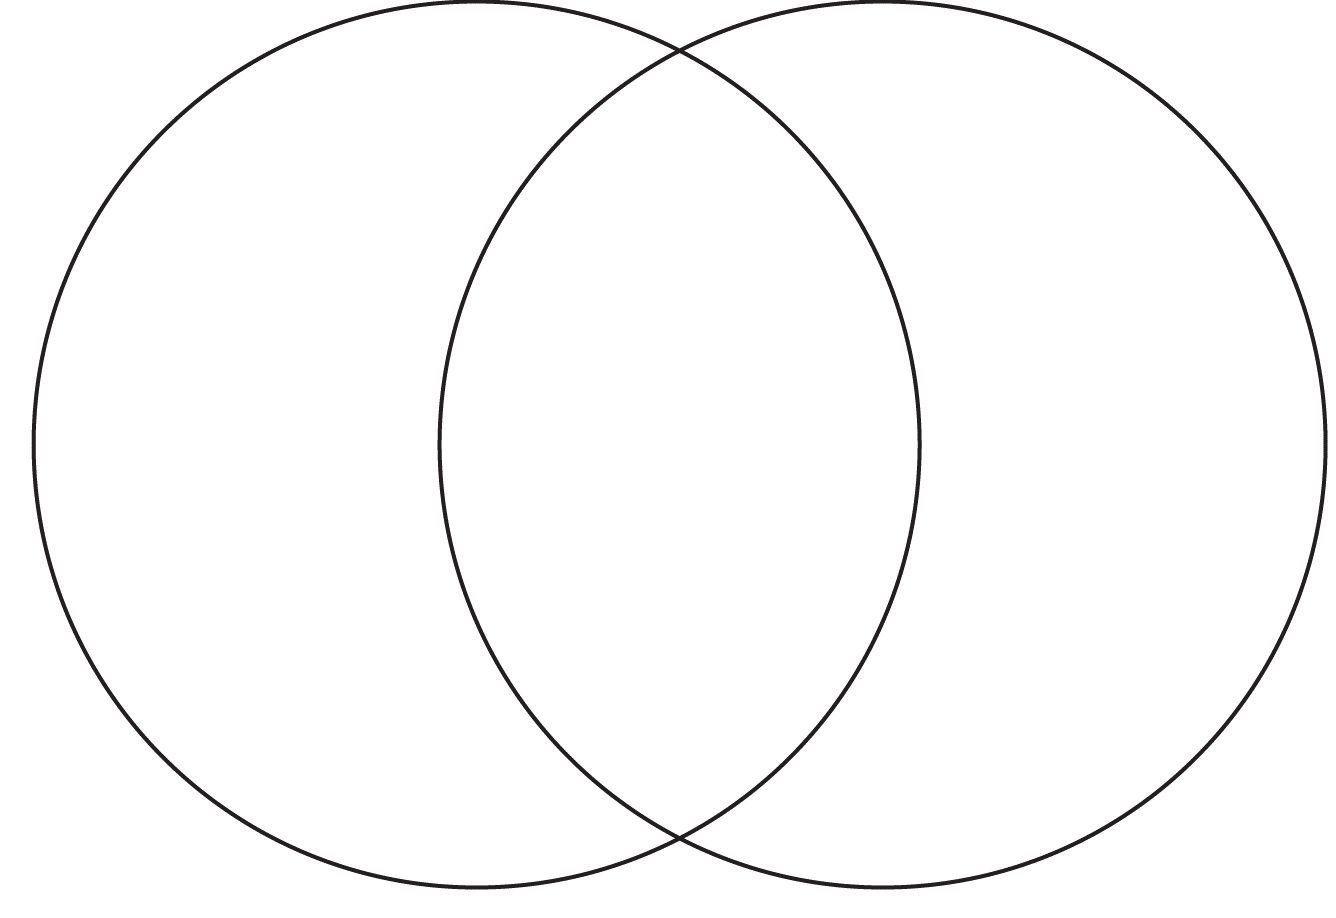 Venn Diagram In Word Printable Page Size Venn Diagram Templatae